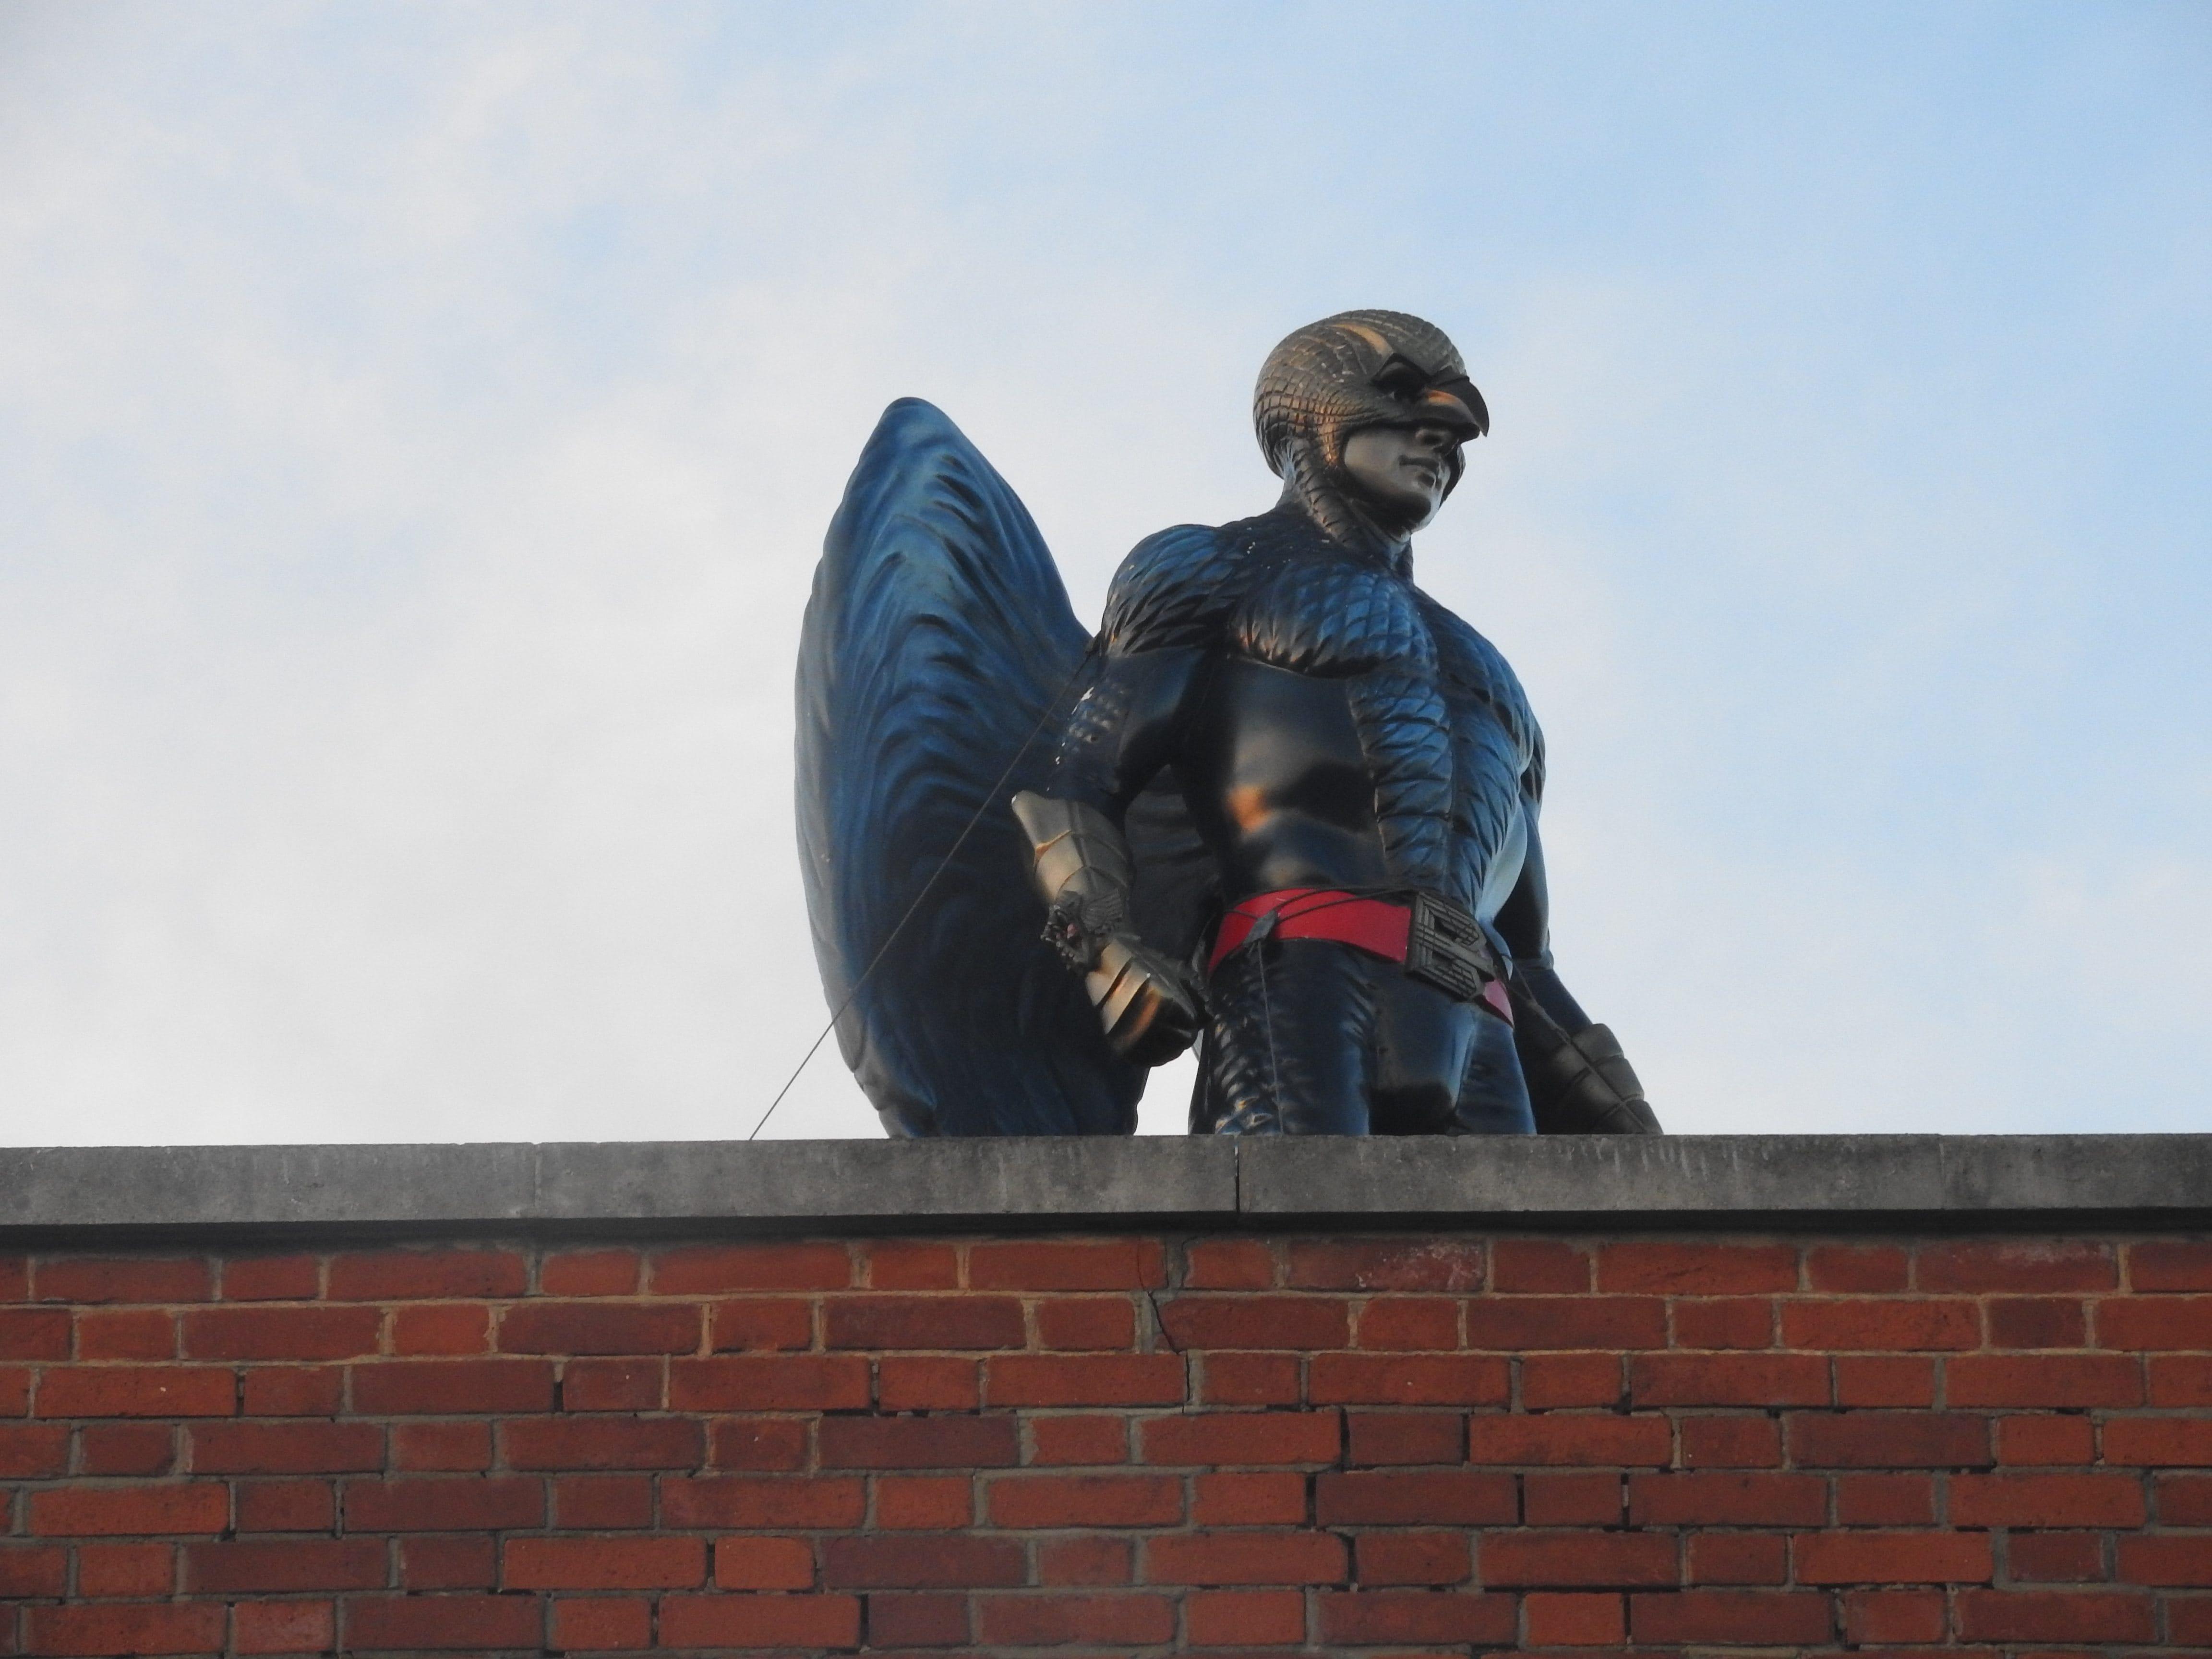 Olympic Studios Birdman